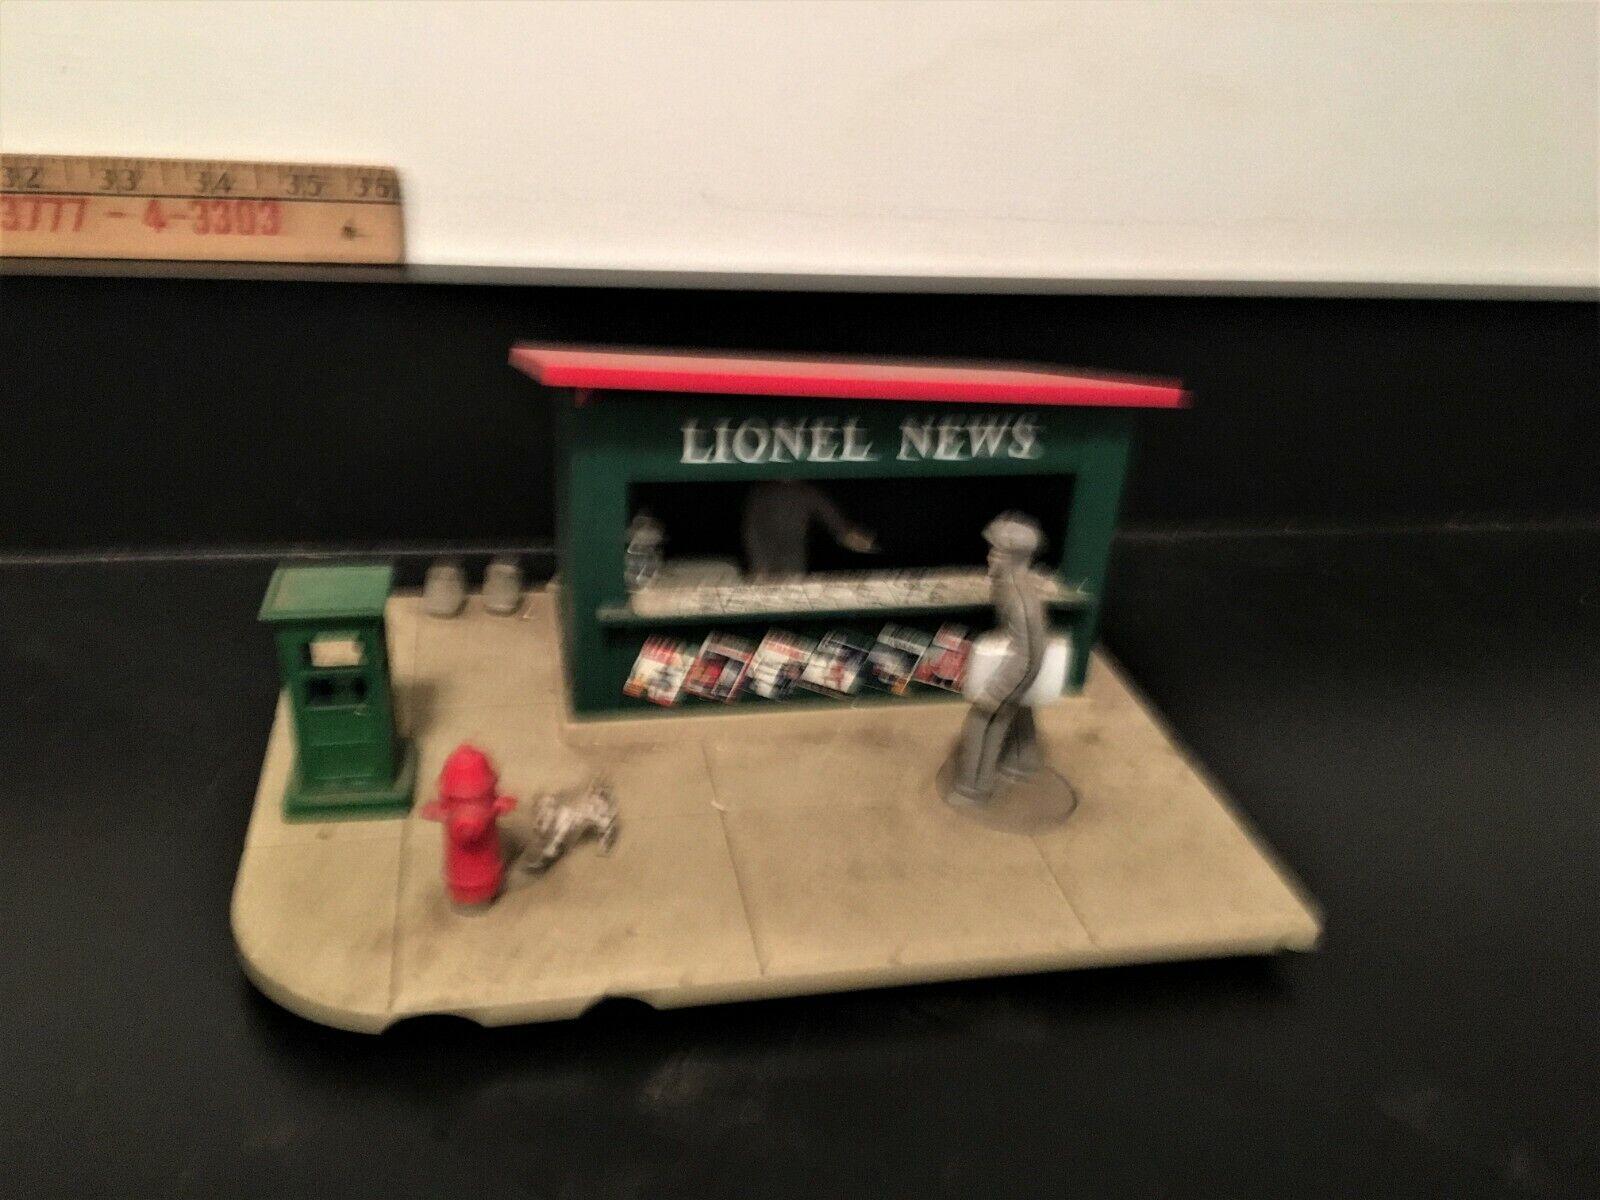 Lionel Postwar O Gauge Operating News Stand